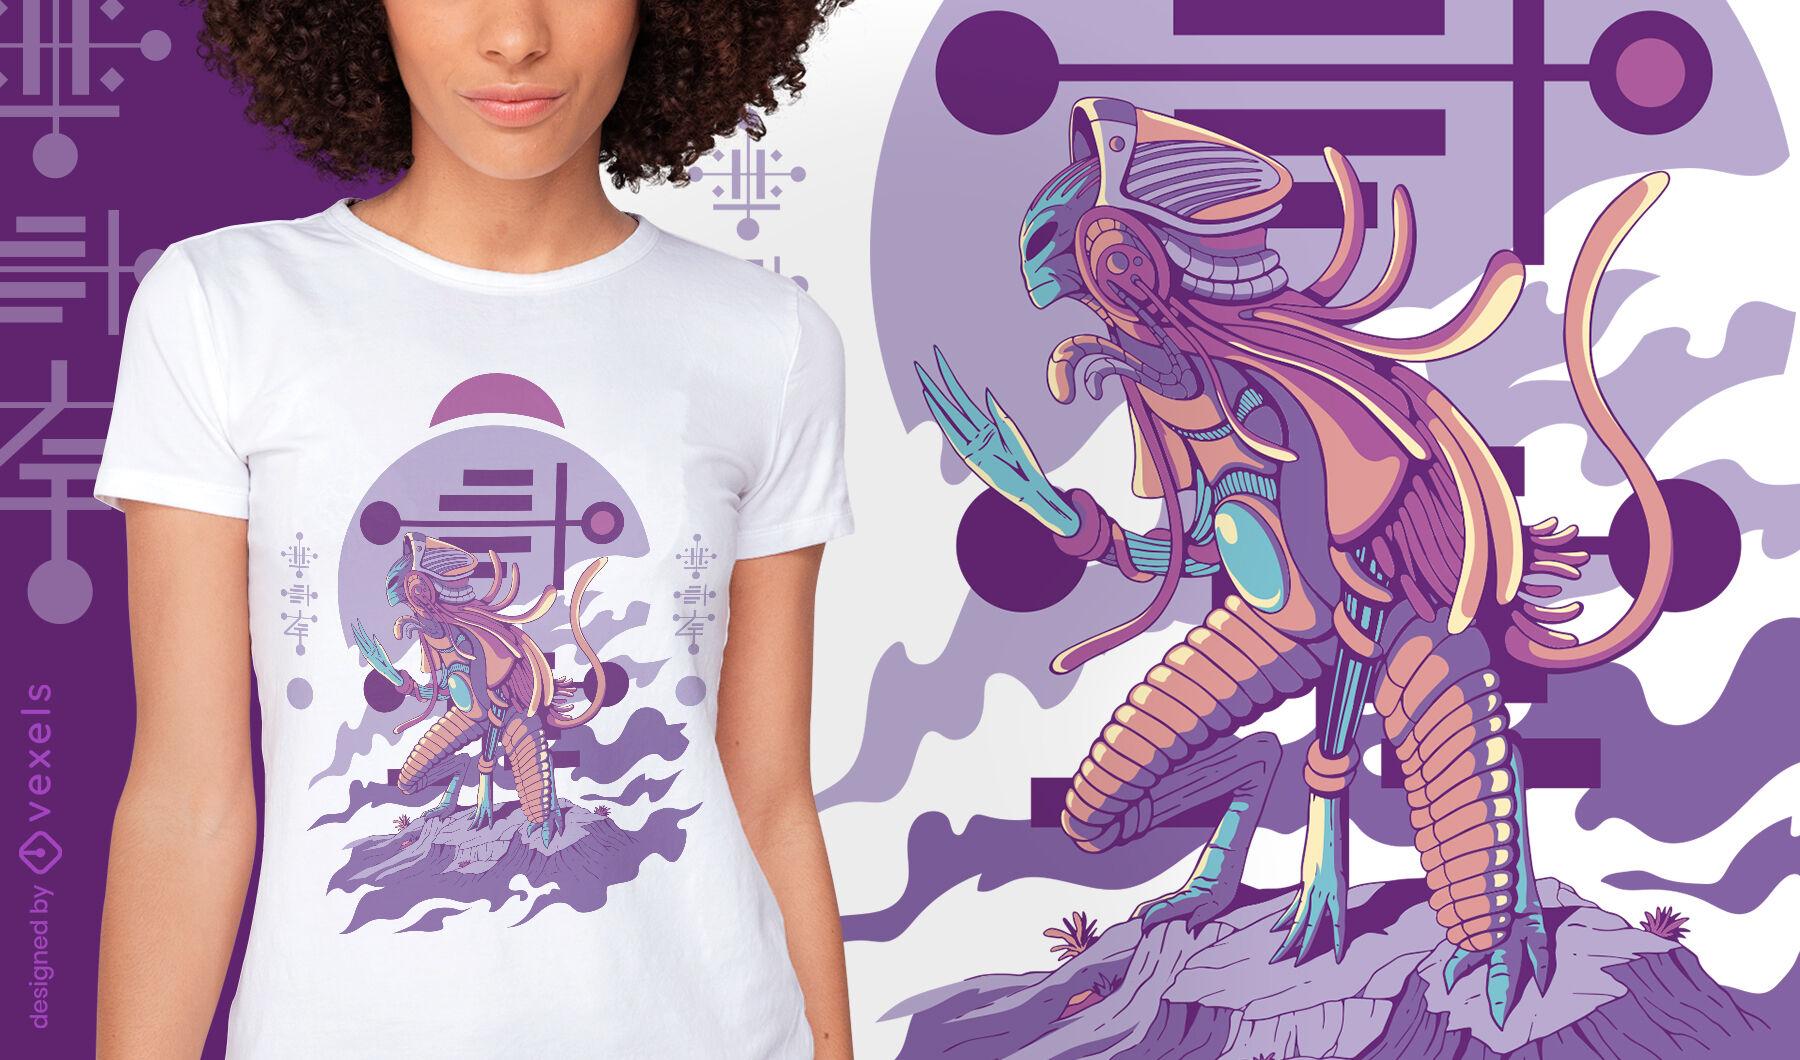 Diseño de camiseta arrodillada criatura alienígena.